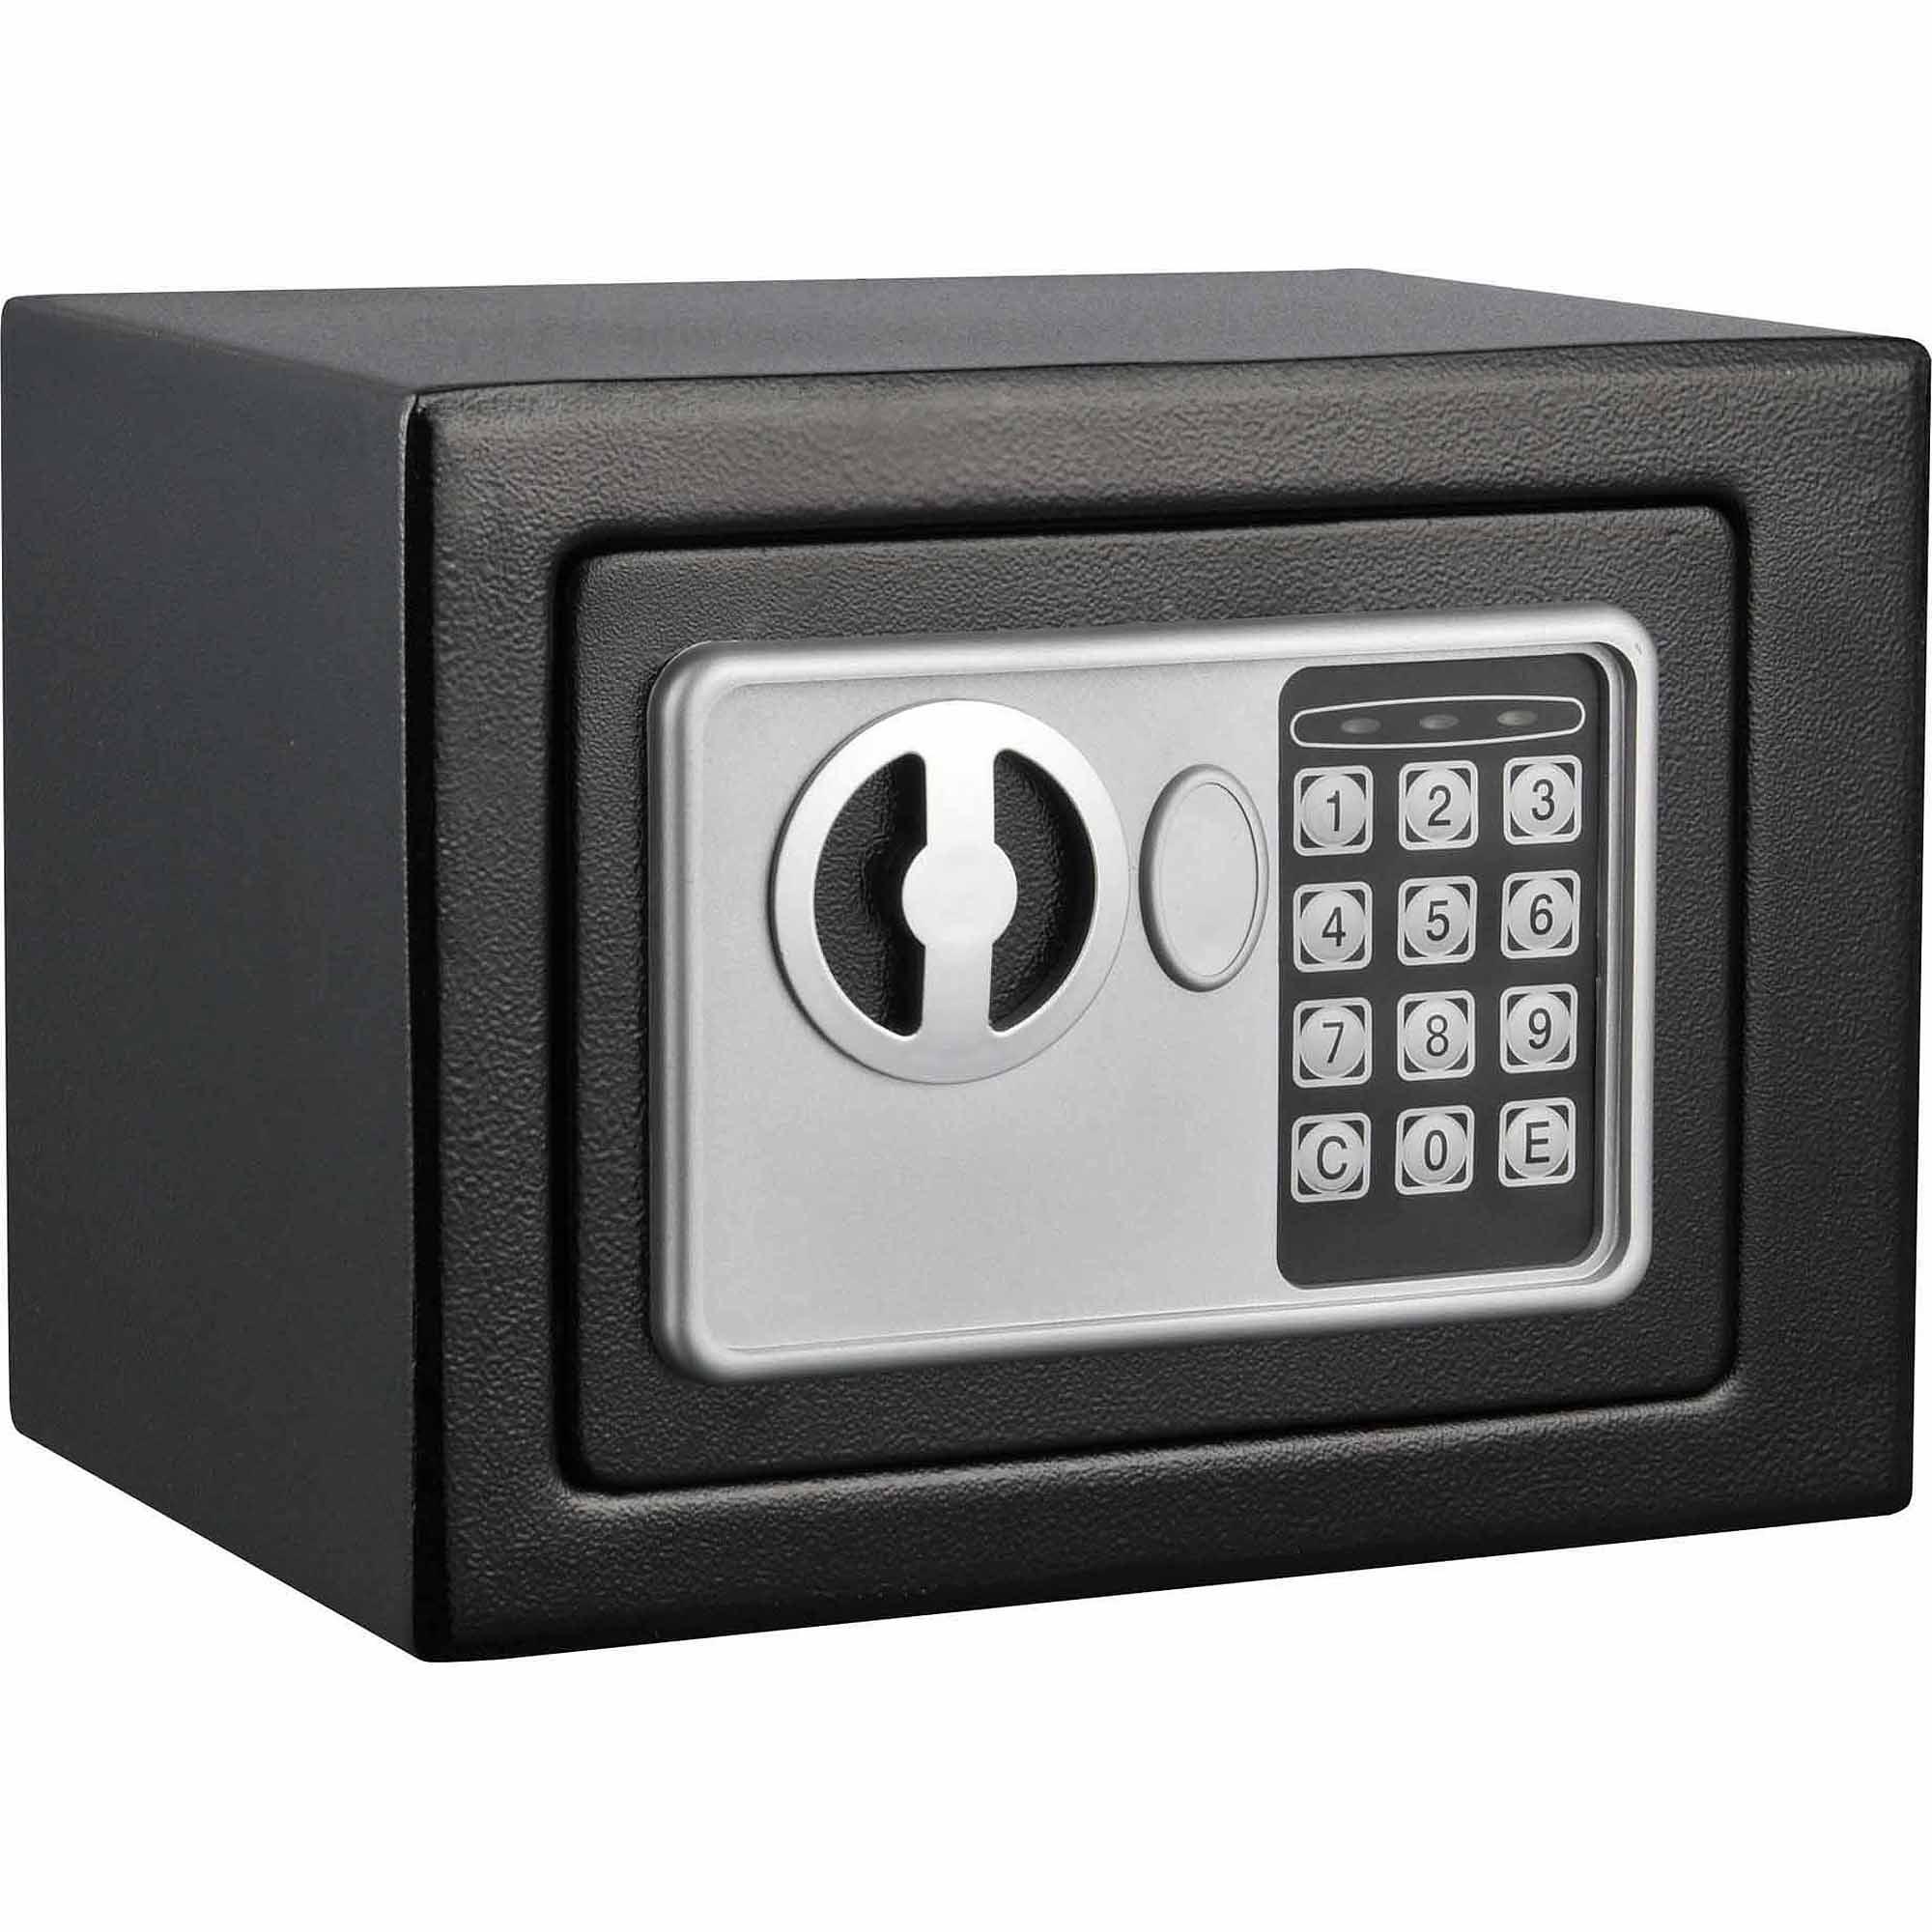 Stalwart Electronic Deluxe Digital Steel Safe, Black